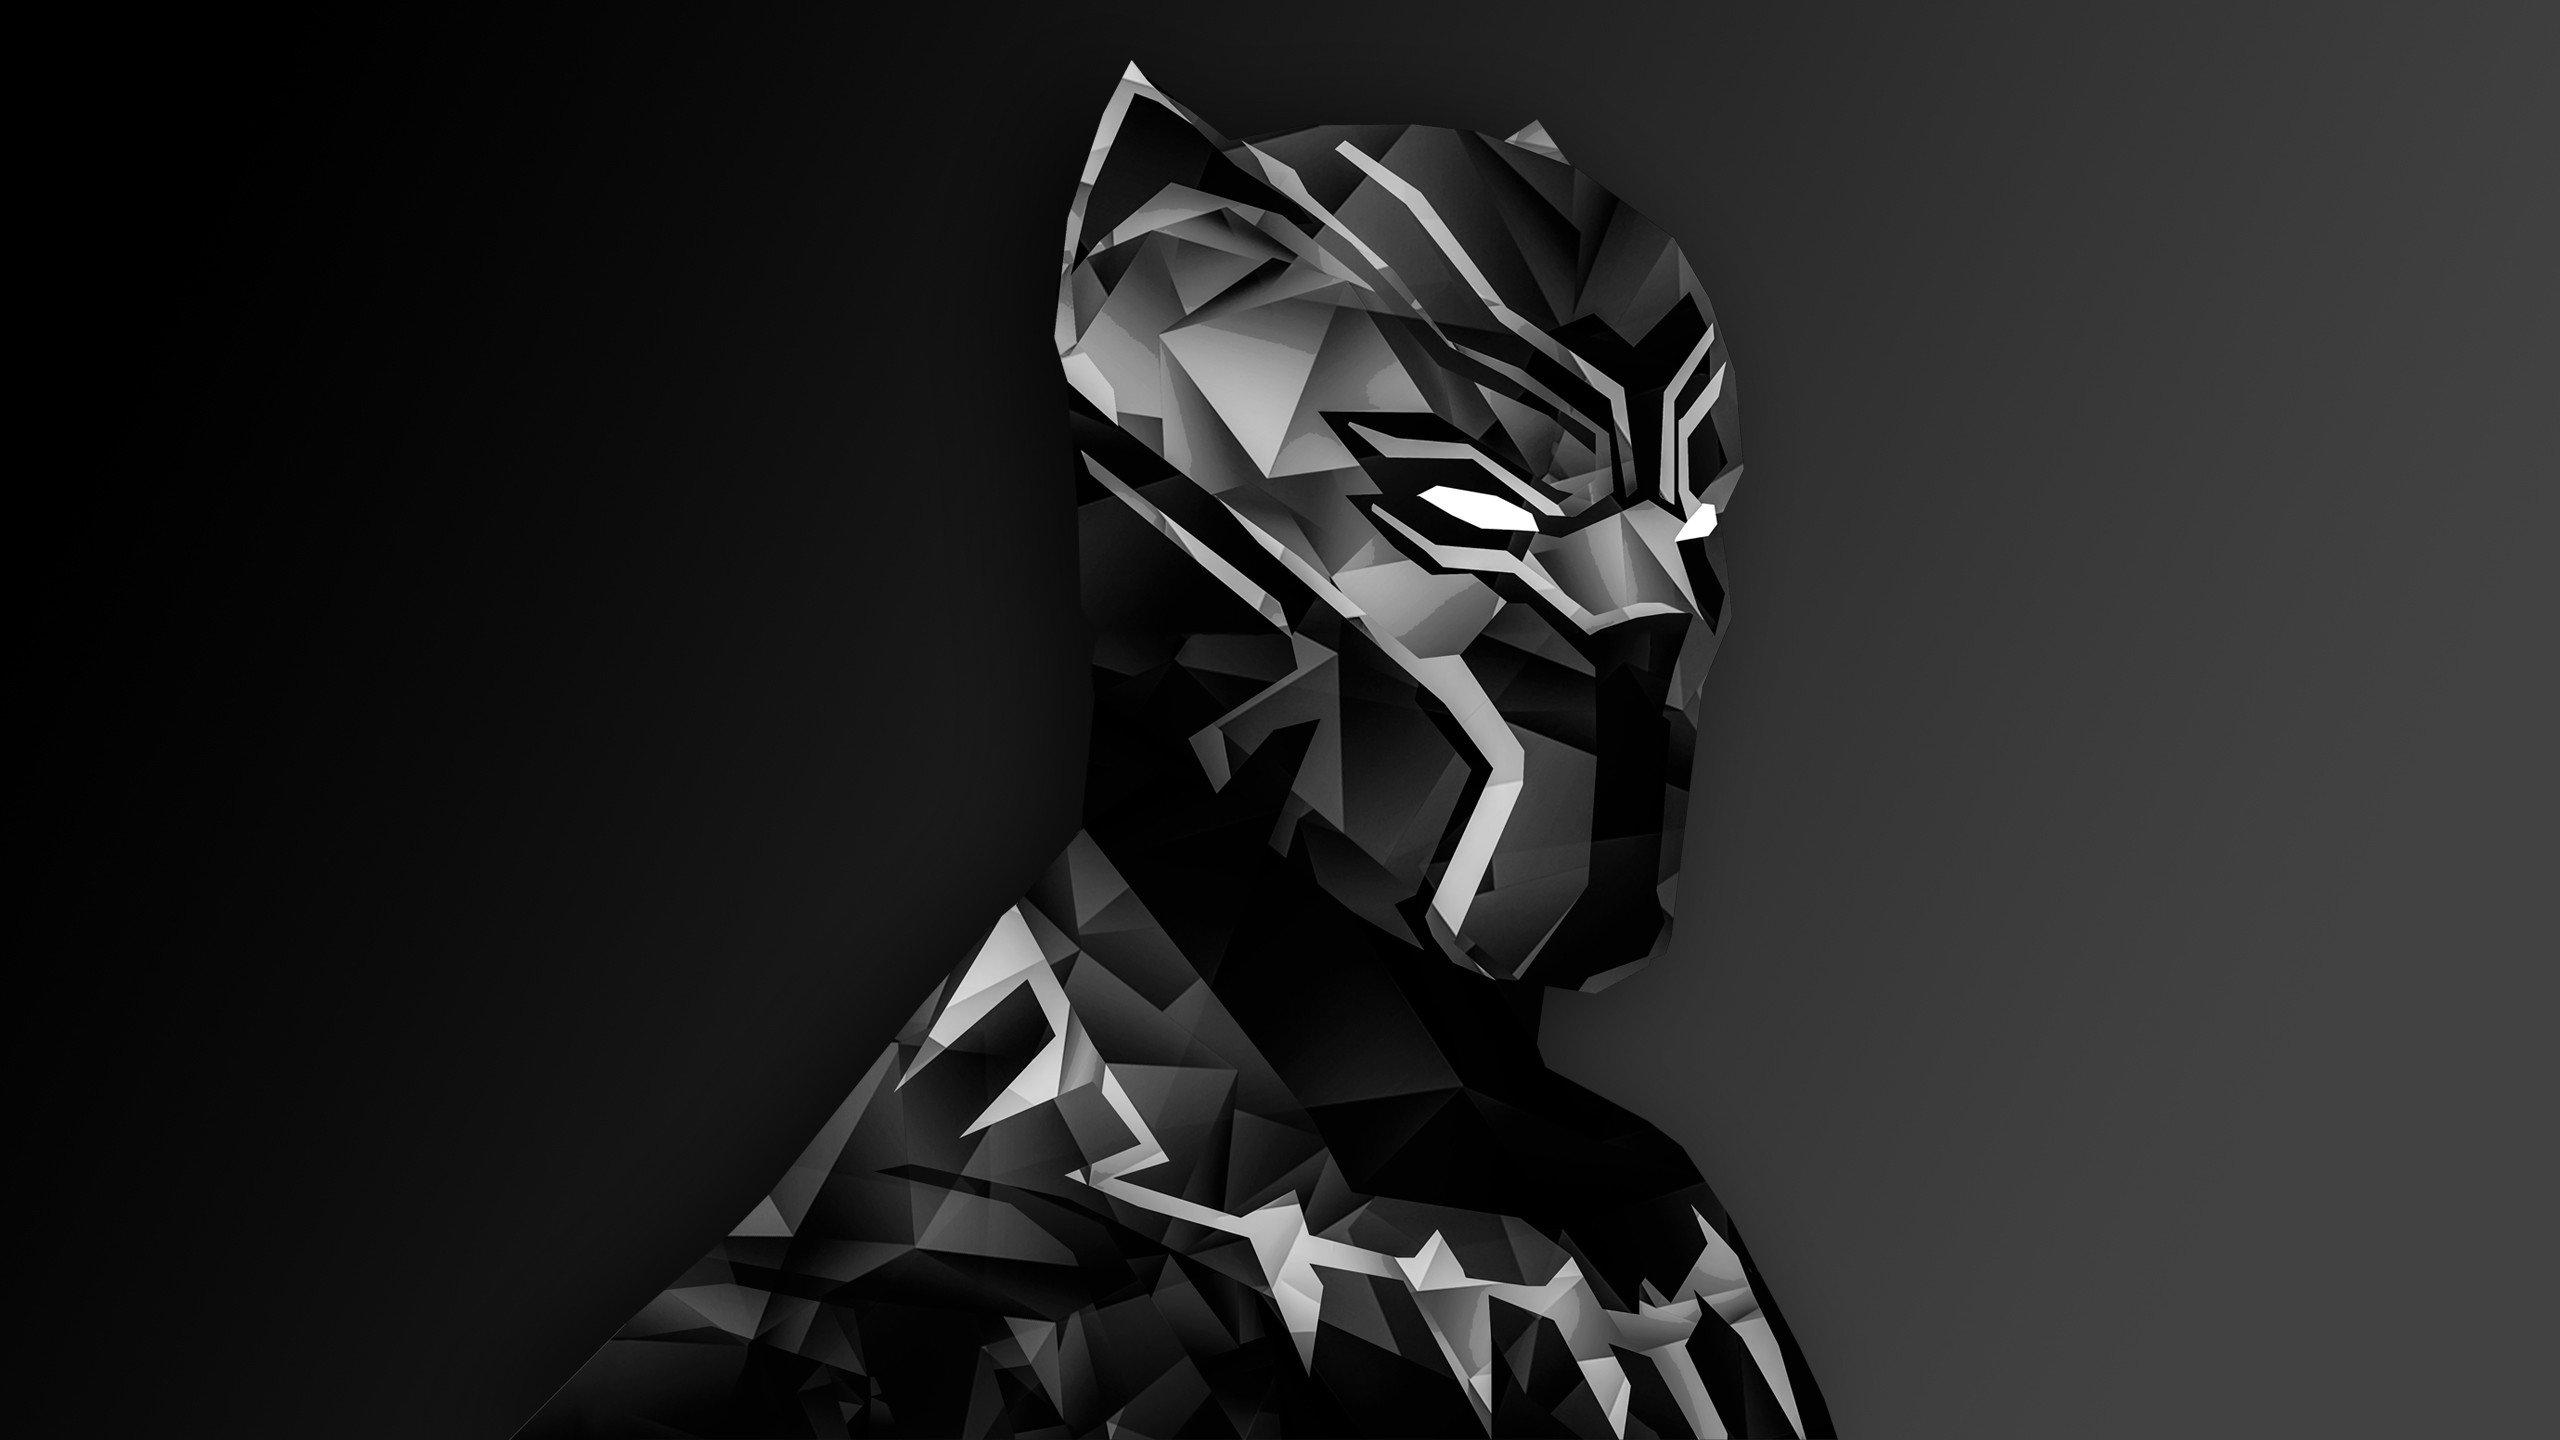 Top Wallpaper Marvel Simple - 386854-Black_Panther-Captain_America_Civil_War-low_poly-digital_art-Marvel_Cinematic_Universe-monochrome-simple_background  Graphic_22960.jpg